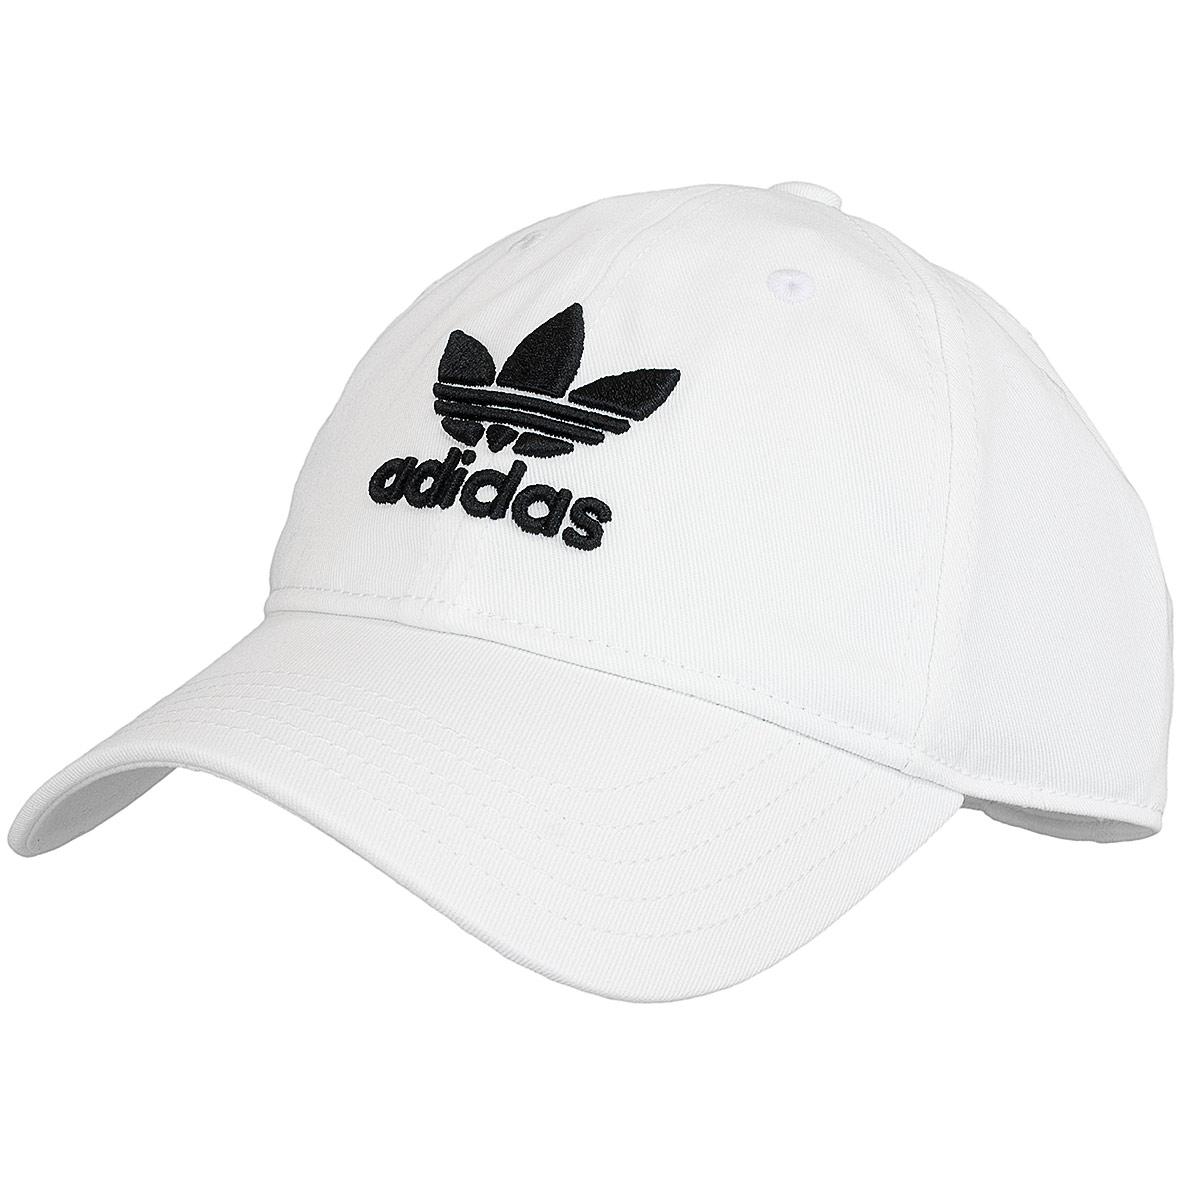 ☆ Adidas Originals Snapback Cap Trefoil weiß hier bestellen!